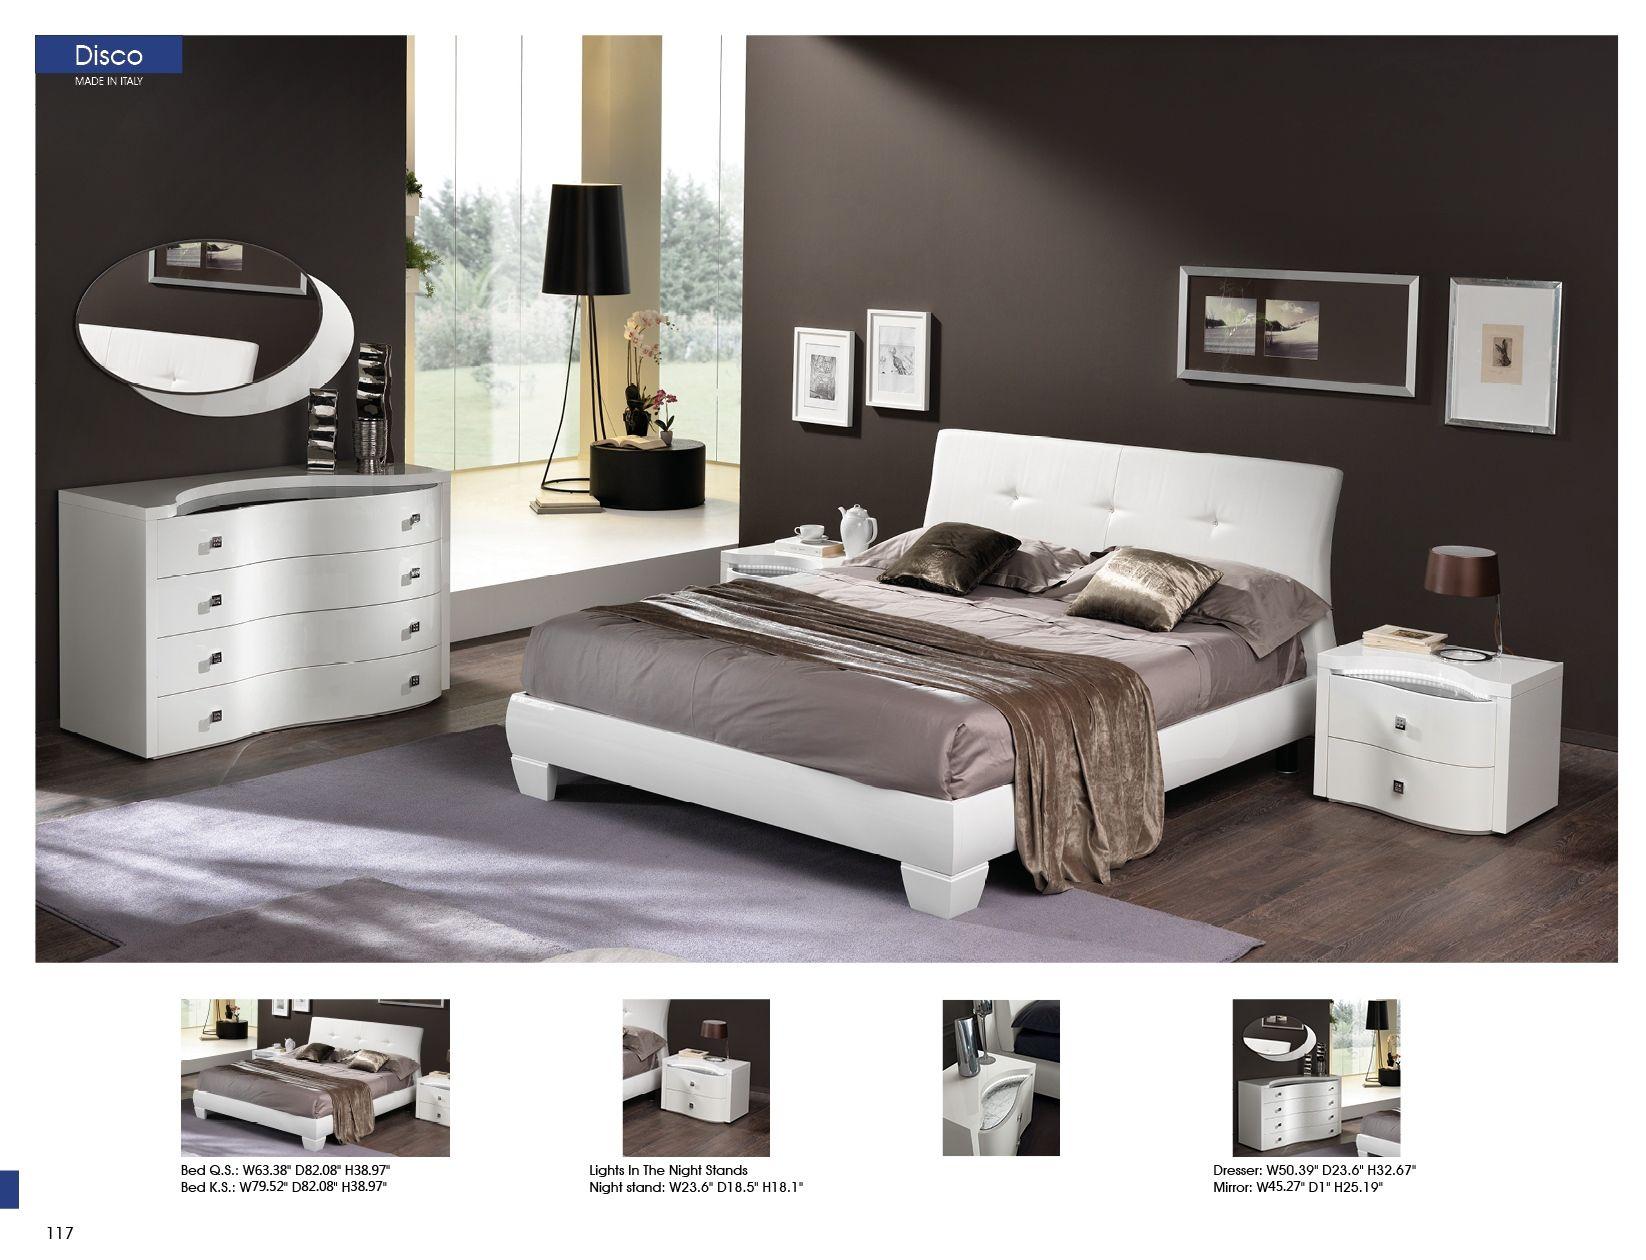 Disco KS Bedroom | Bedroom furniture sets, Bedroom set ...